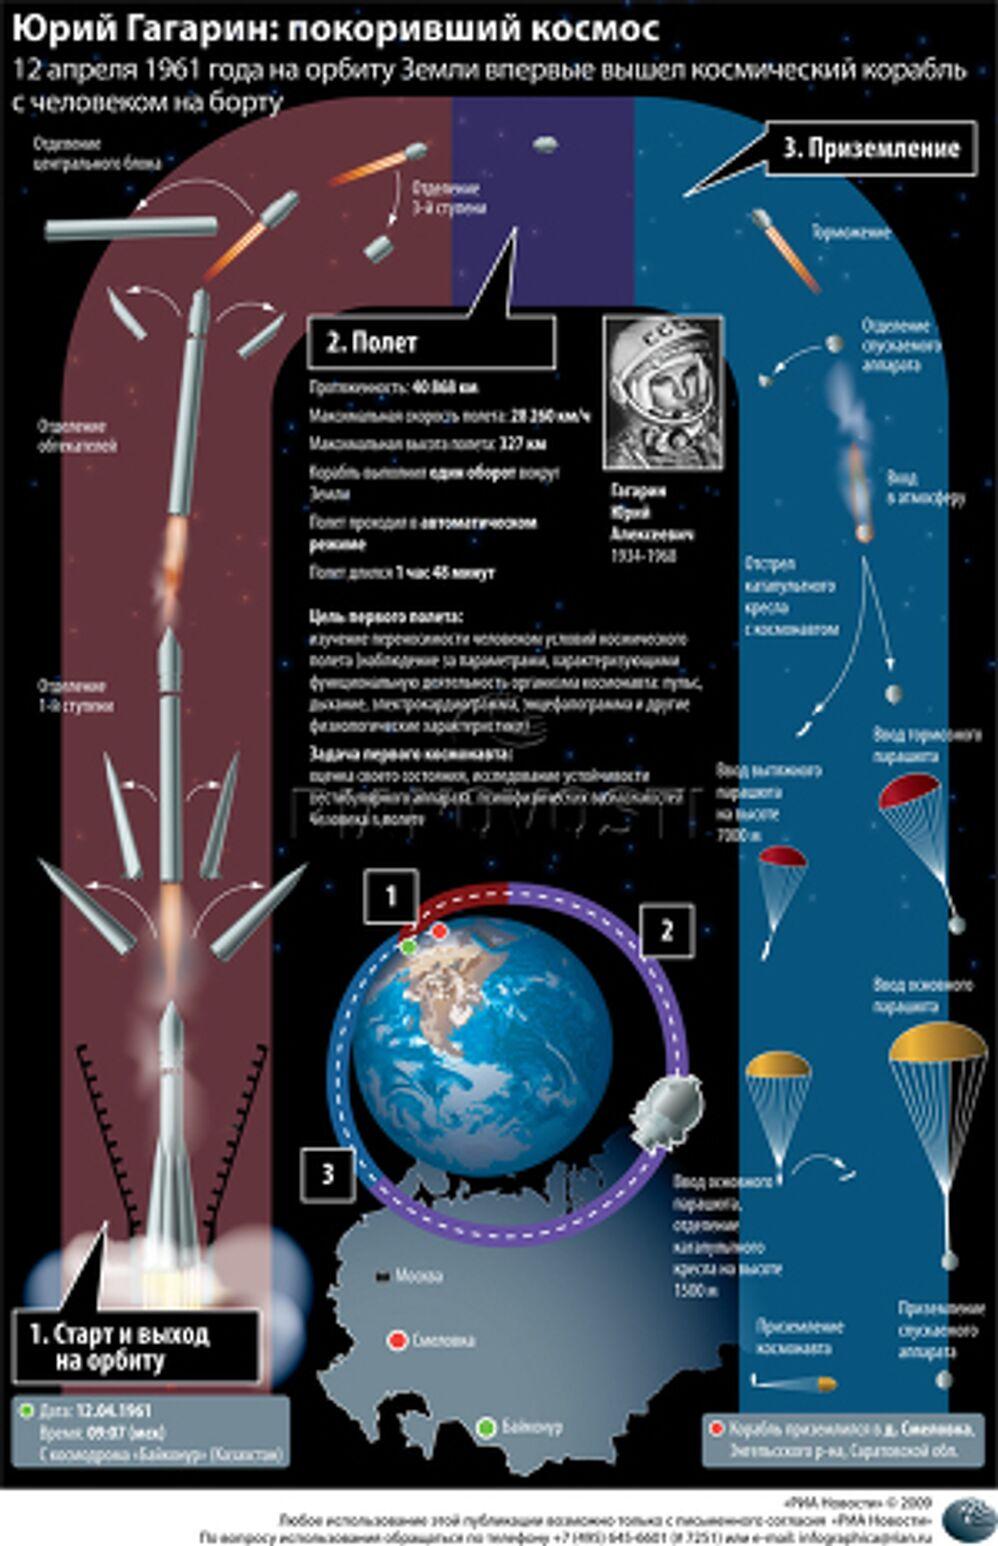 Юрий Гагарин: покоривший космос